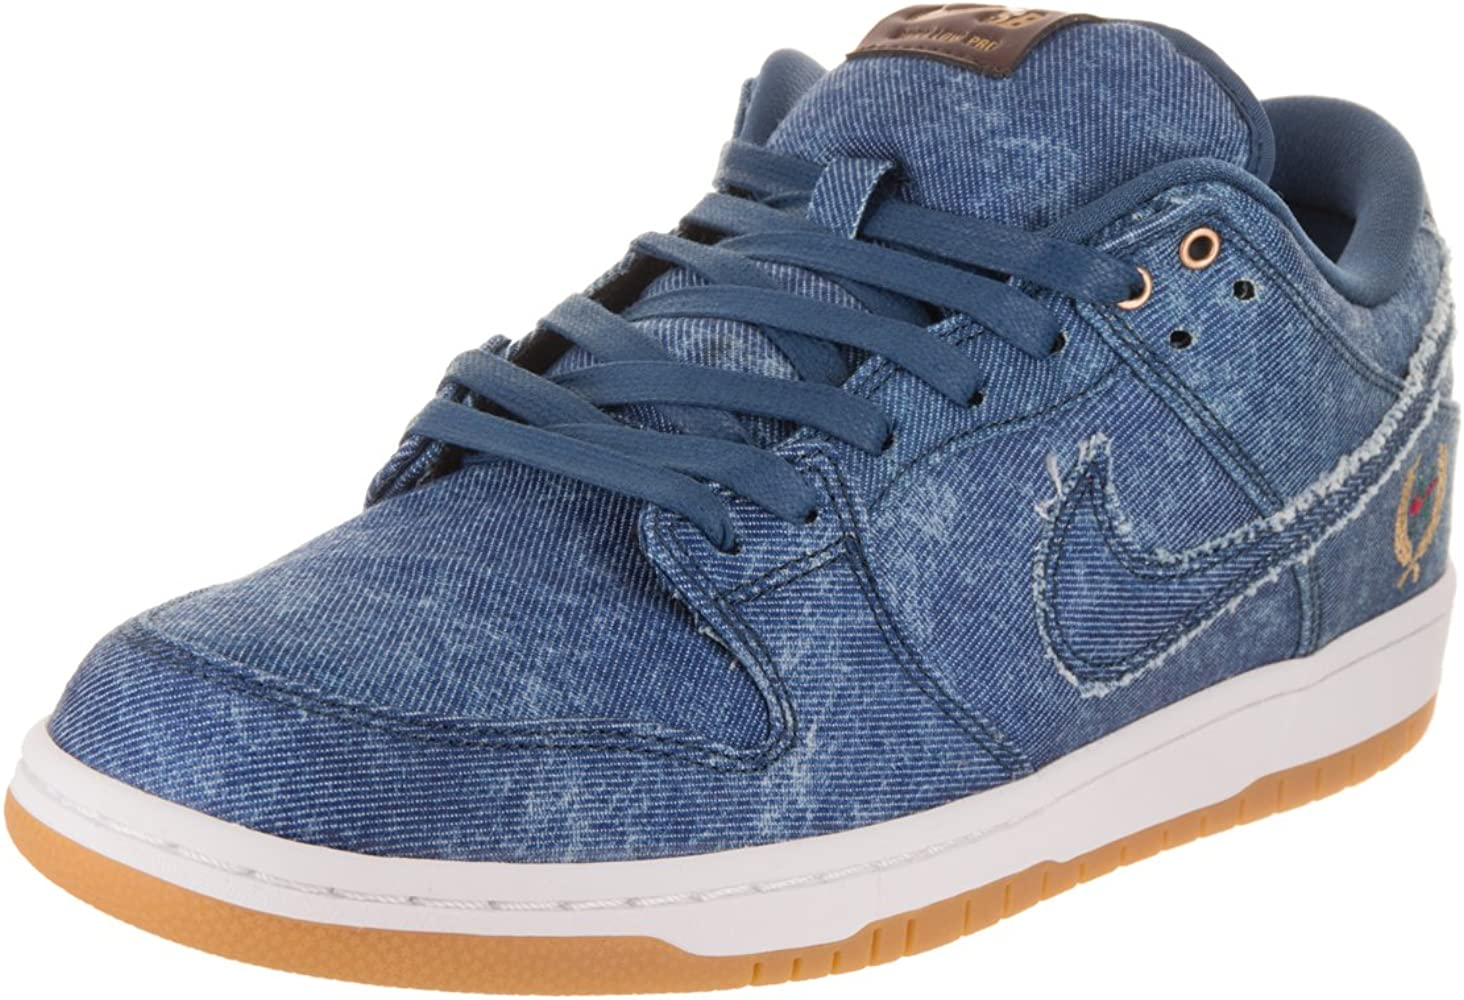 SB Dunk Low TRD QS Skate Shoe